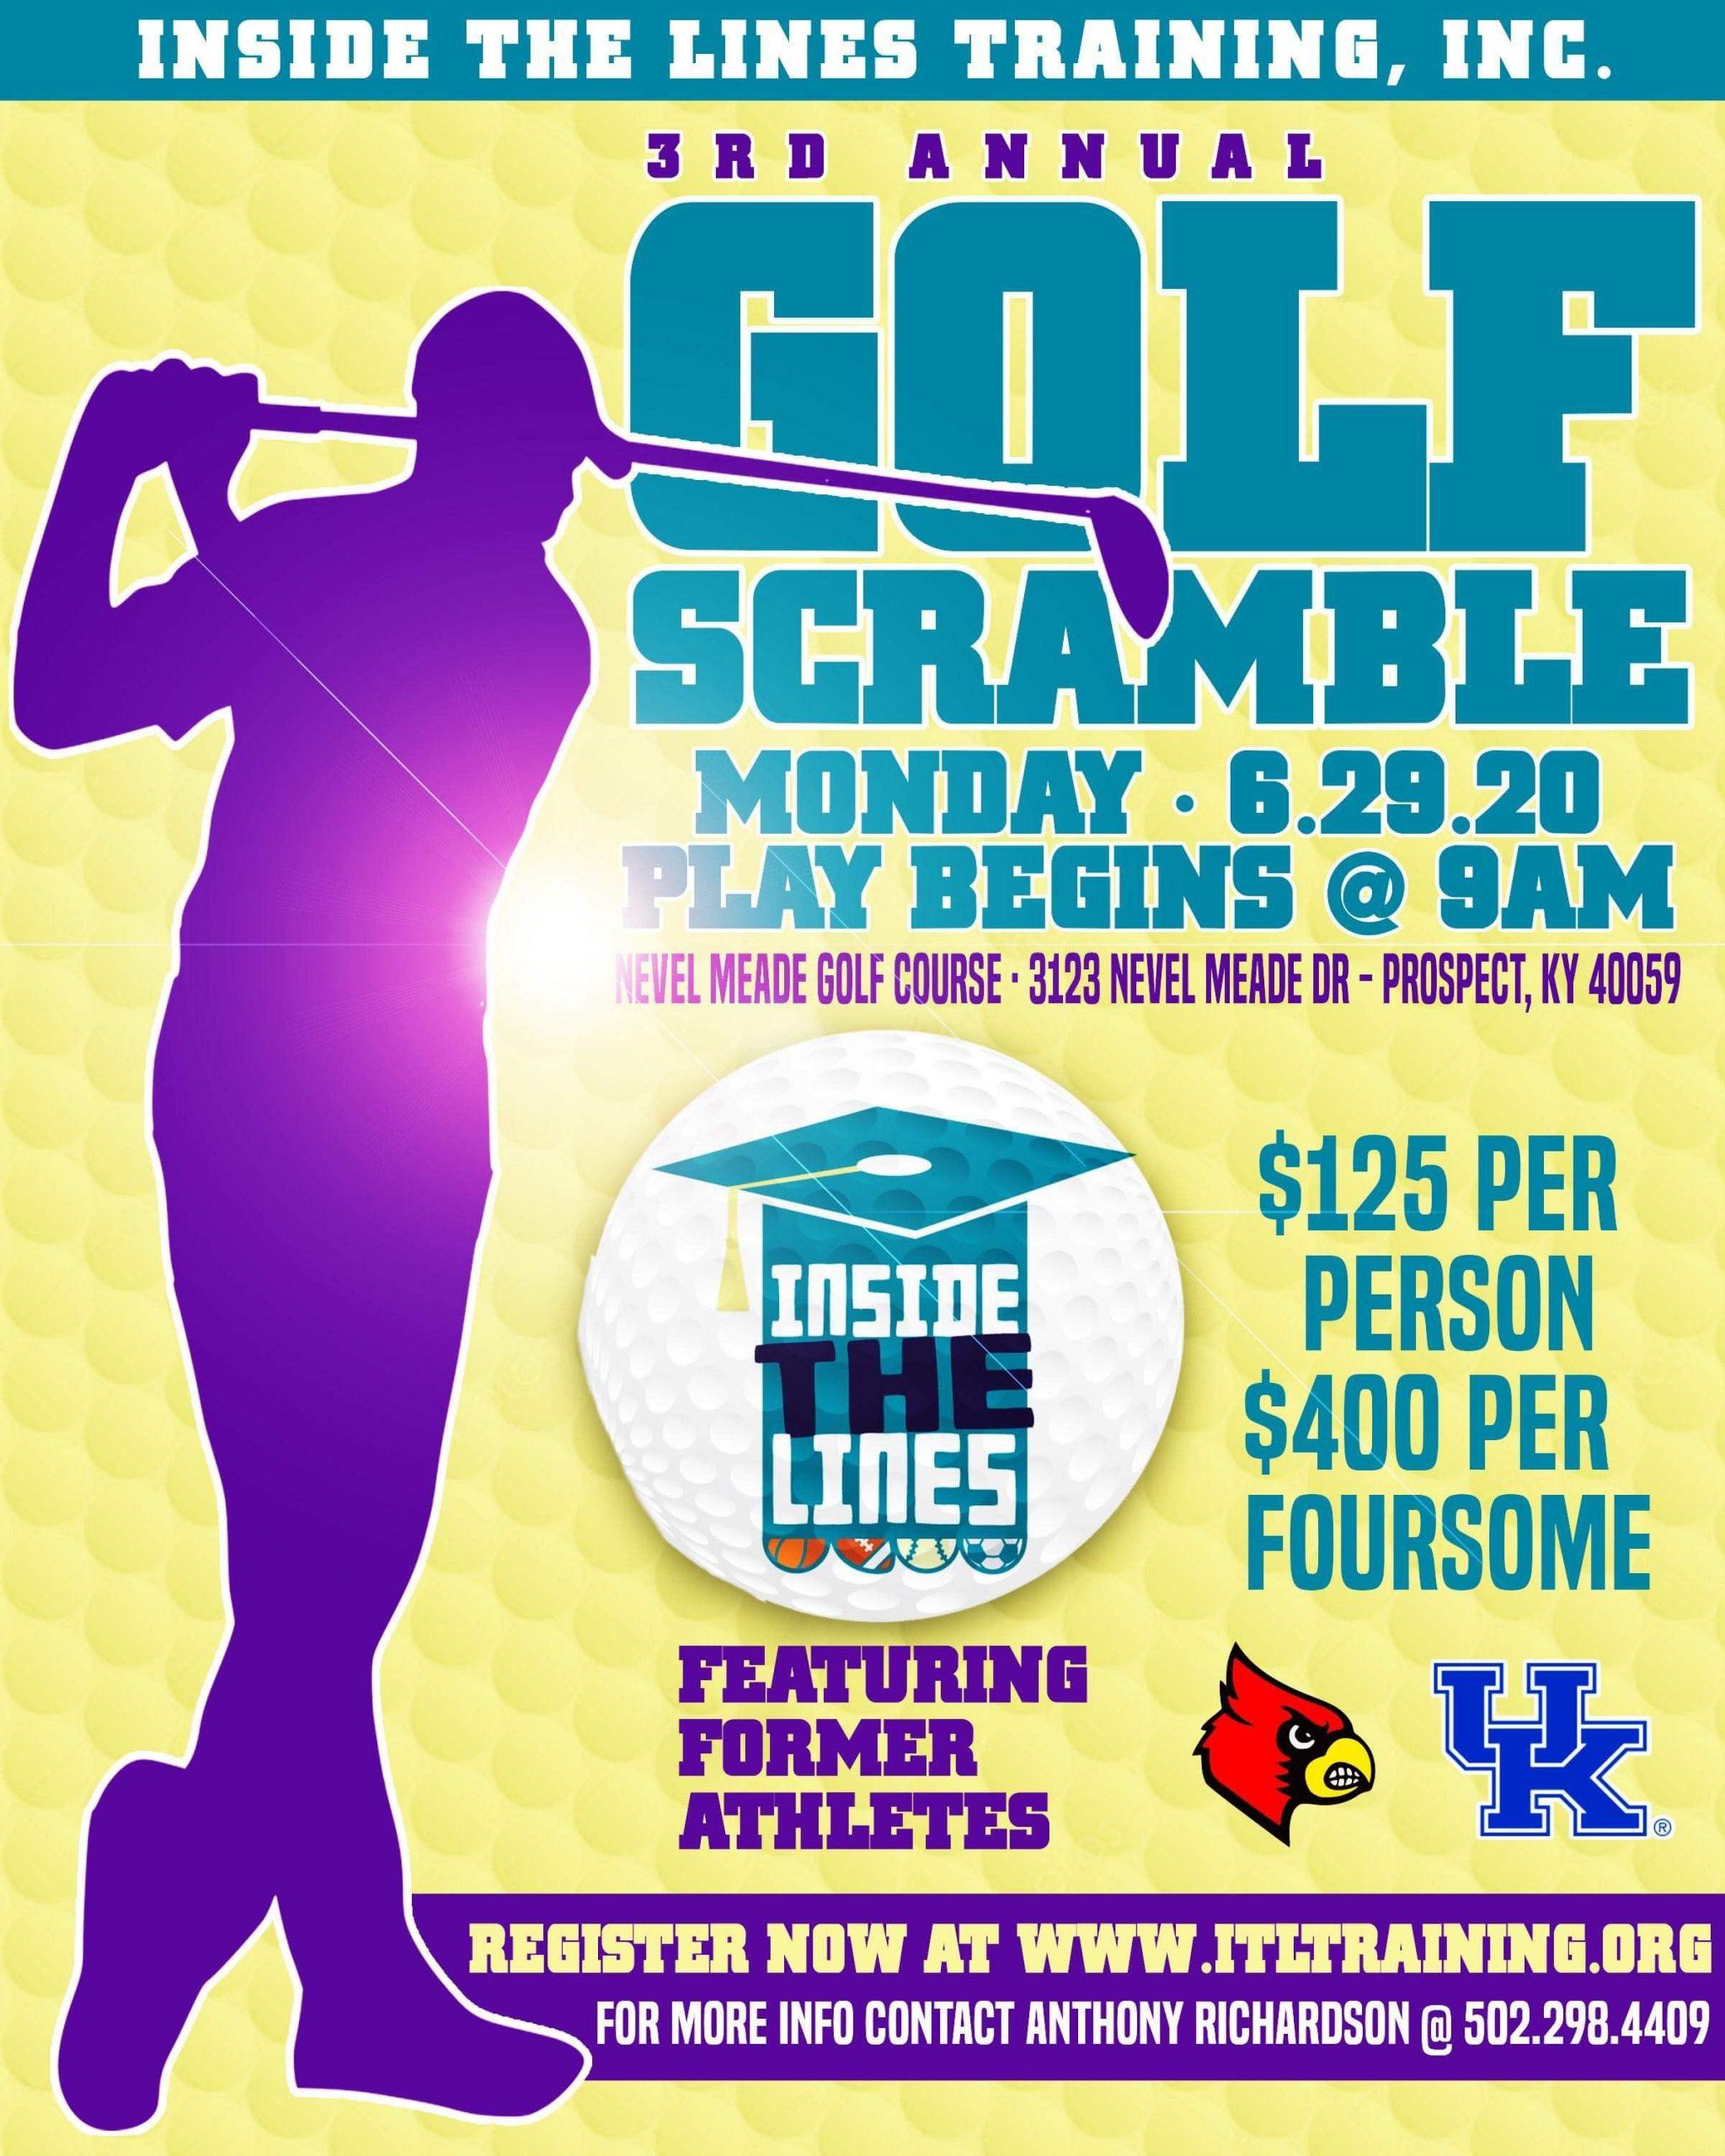 3rd Annual Inside the Lines Training, Inc. Golf Scramble